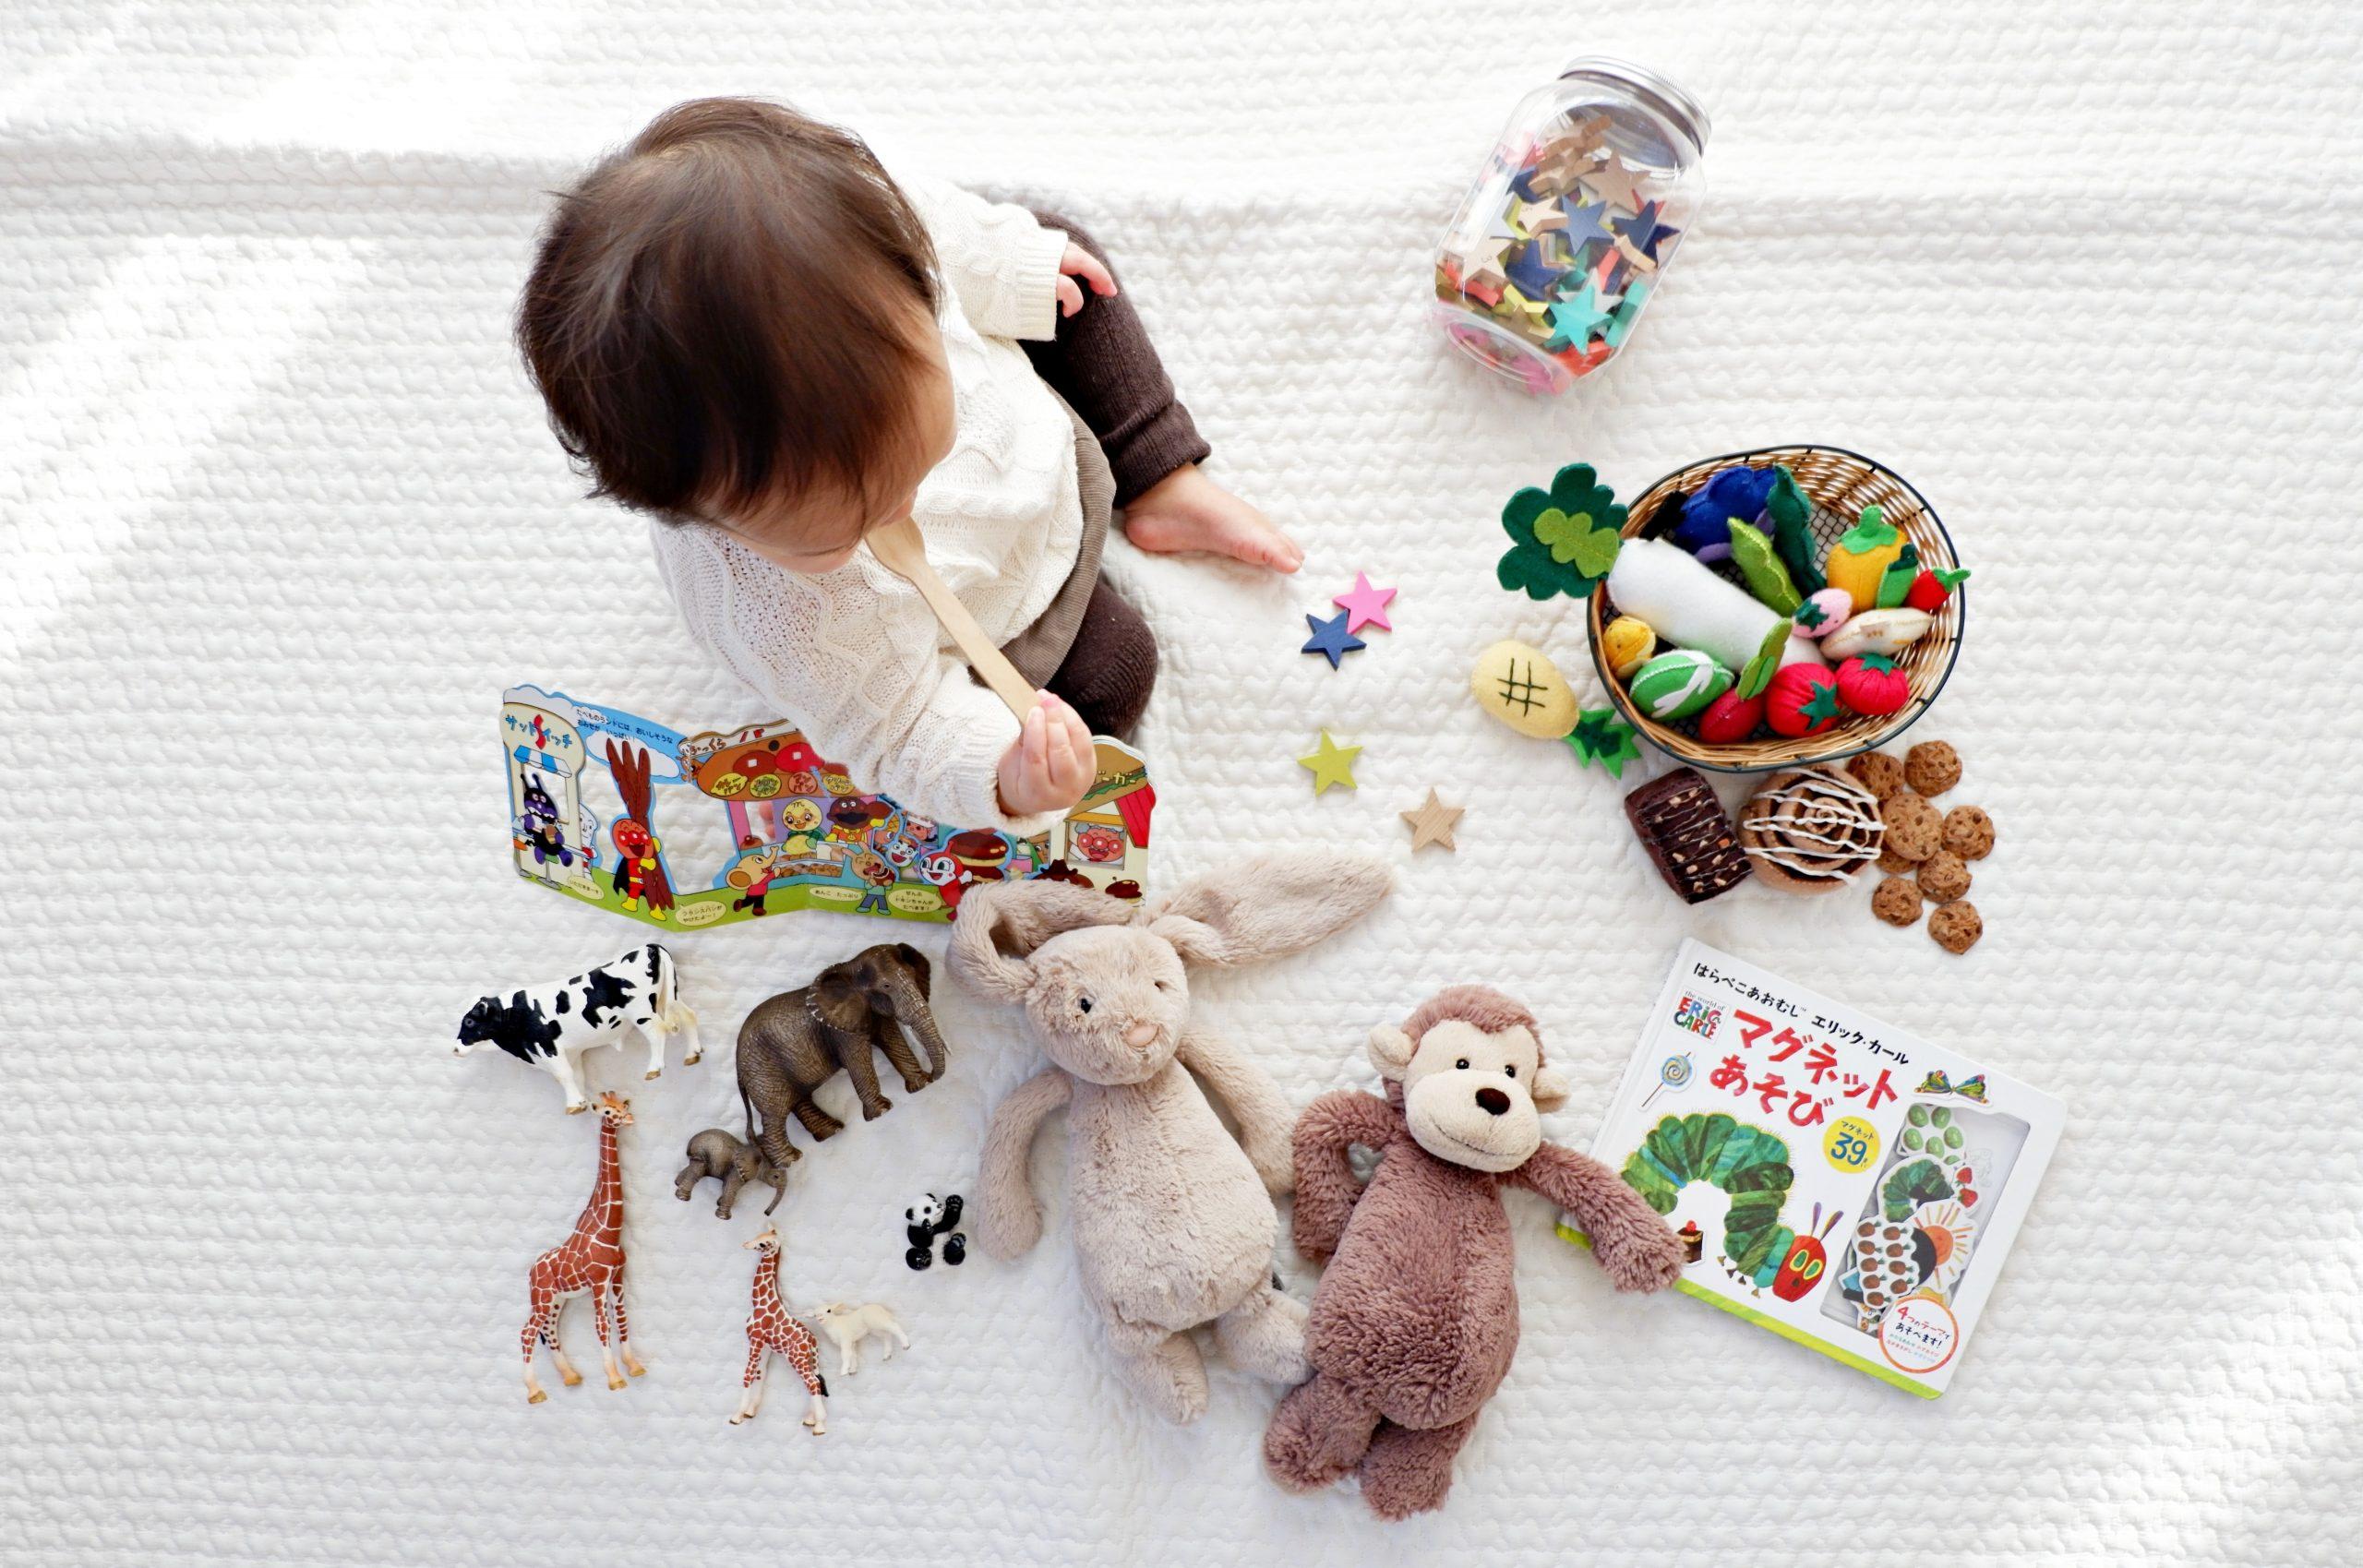 Baby Milestones 10 - 12 Months